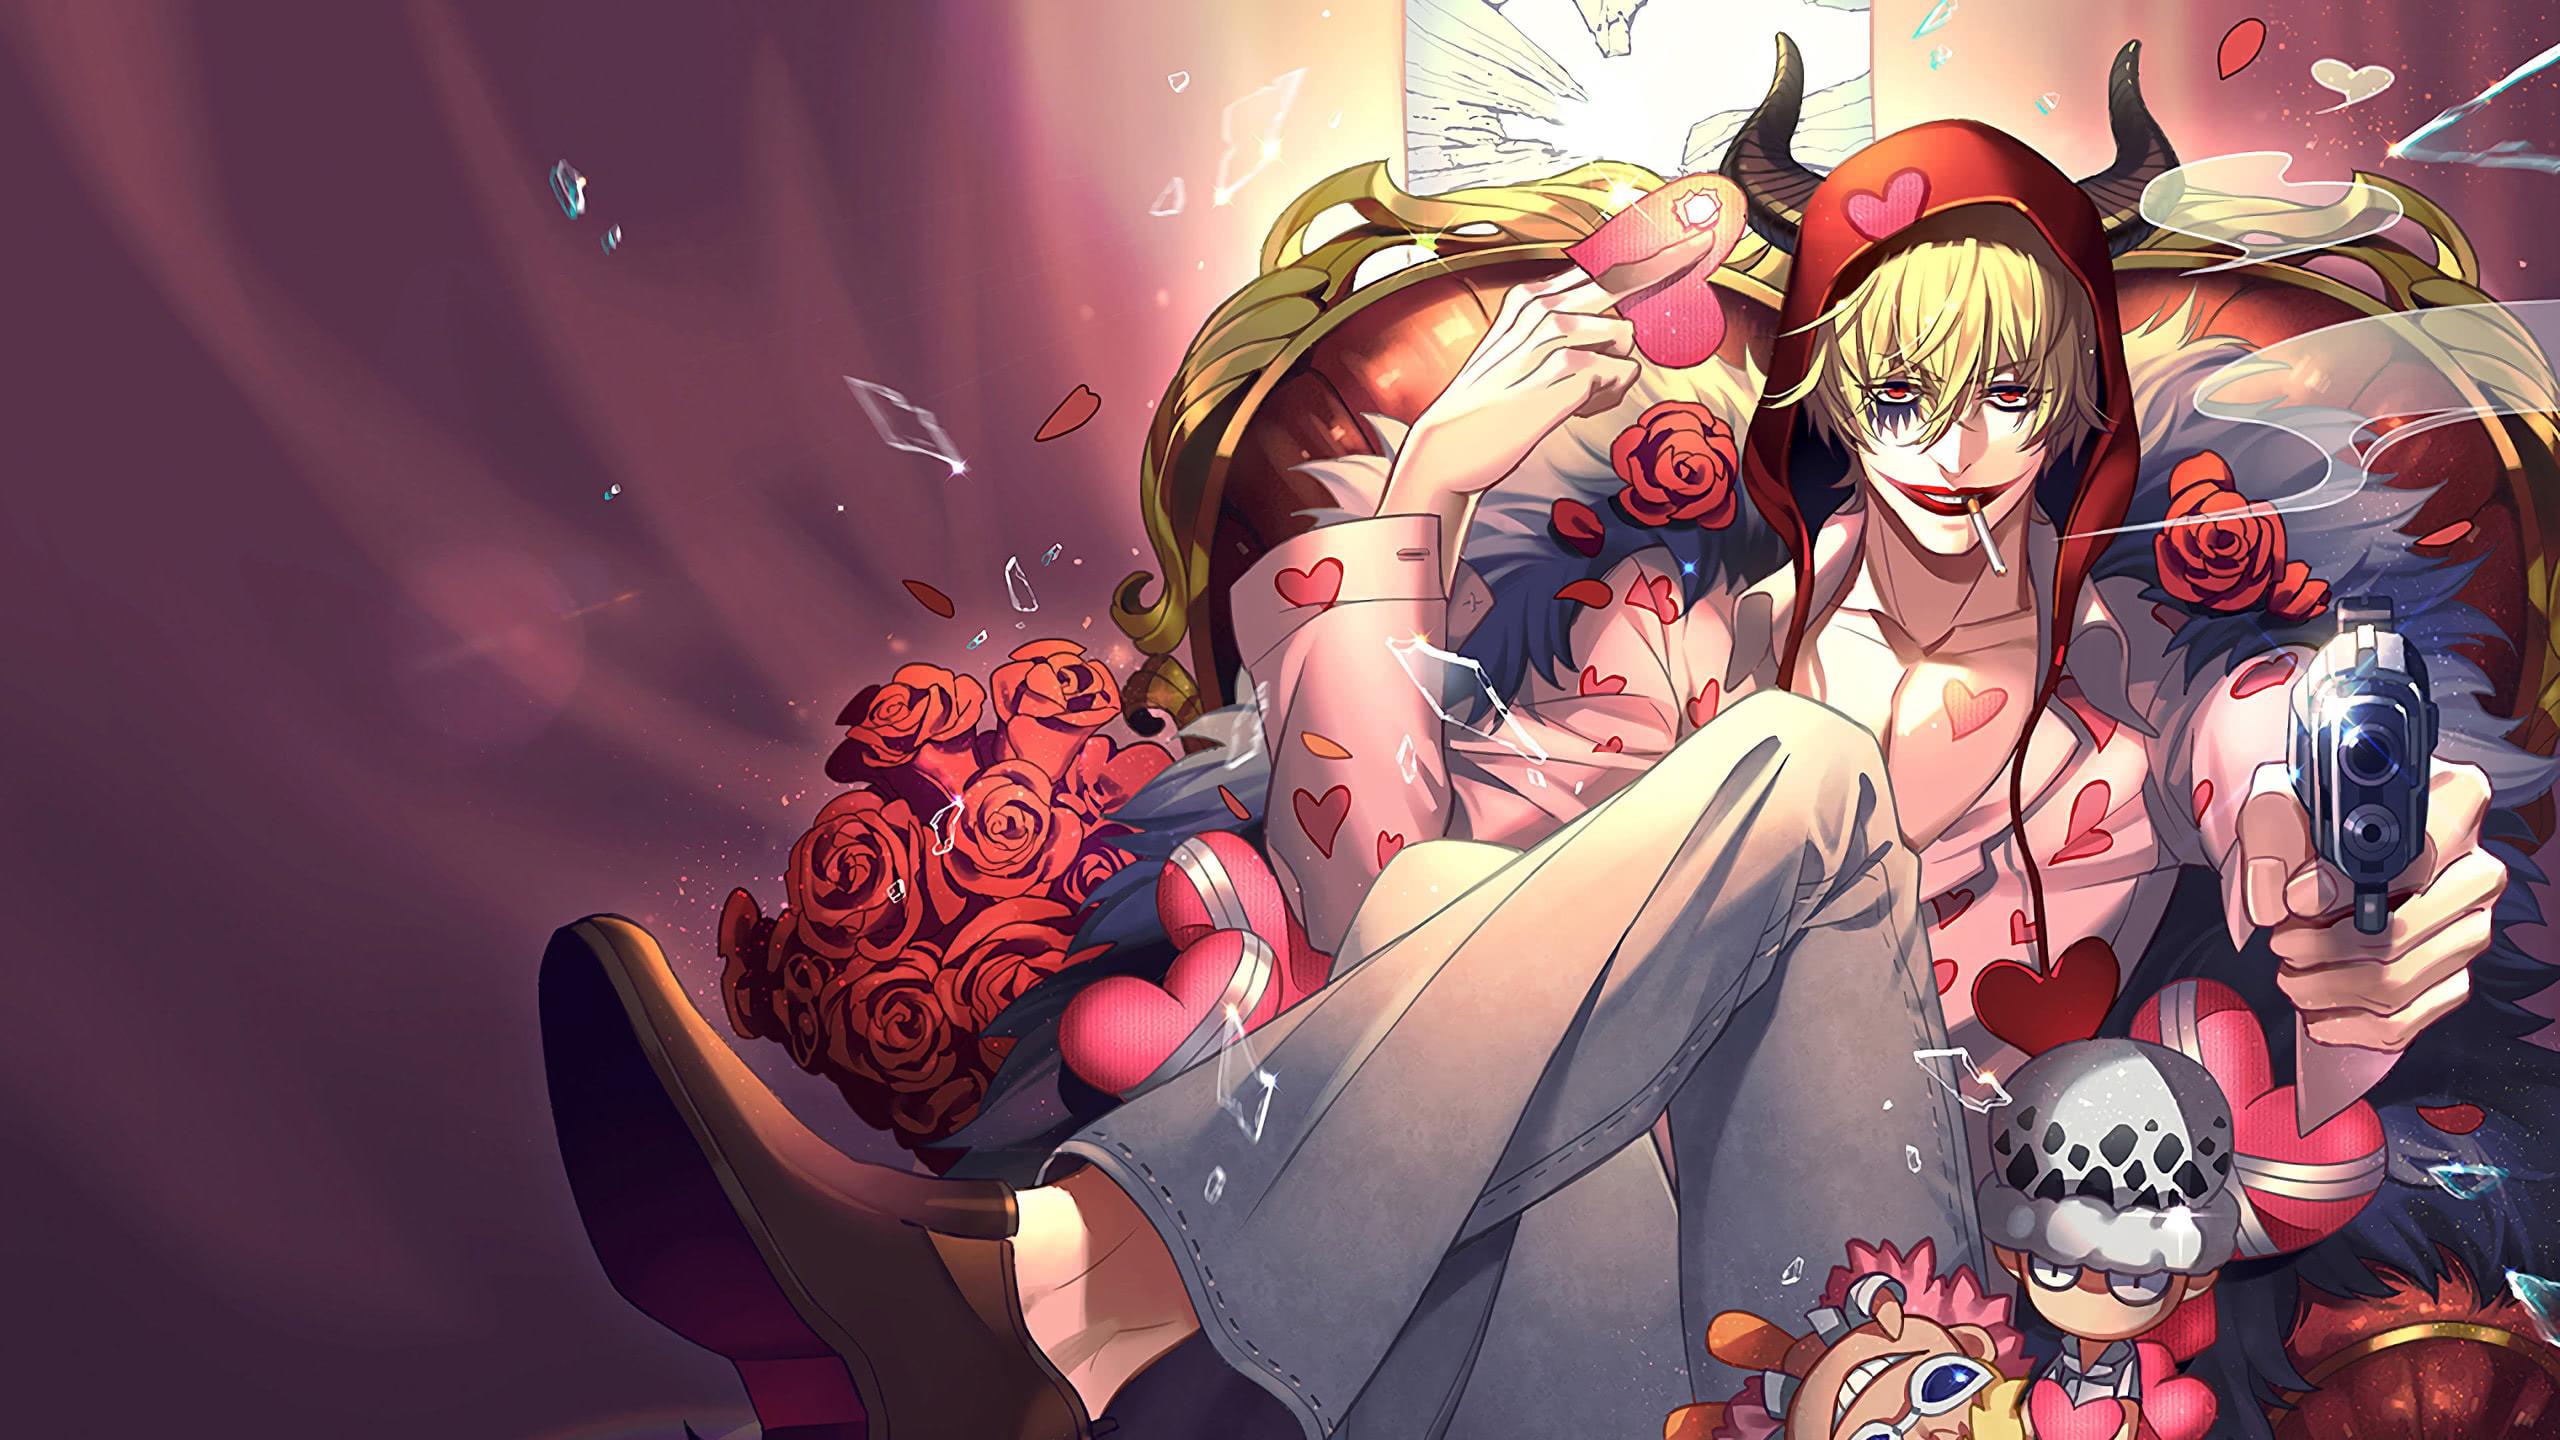 One Piece Corazon Donquixote Rosinante Wqhd 1440p Wallpaper Pixelz